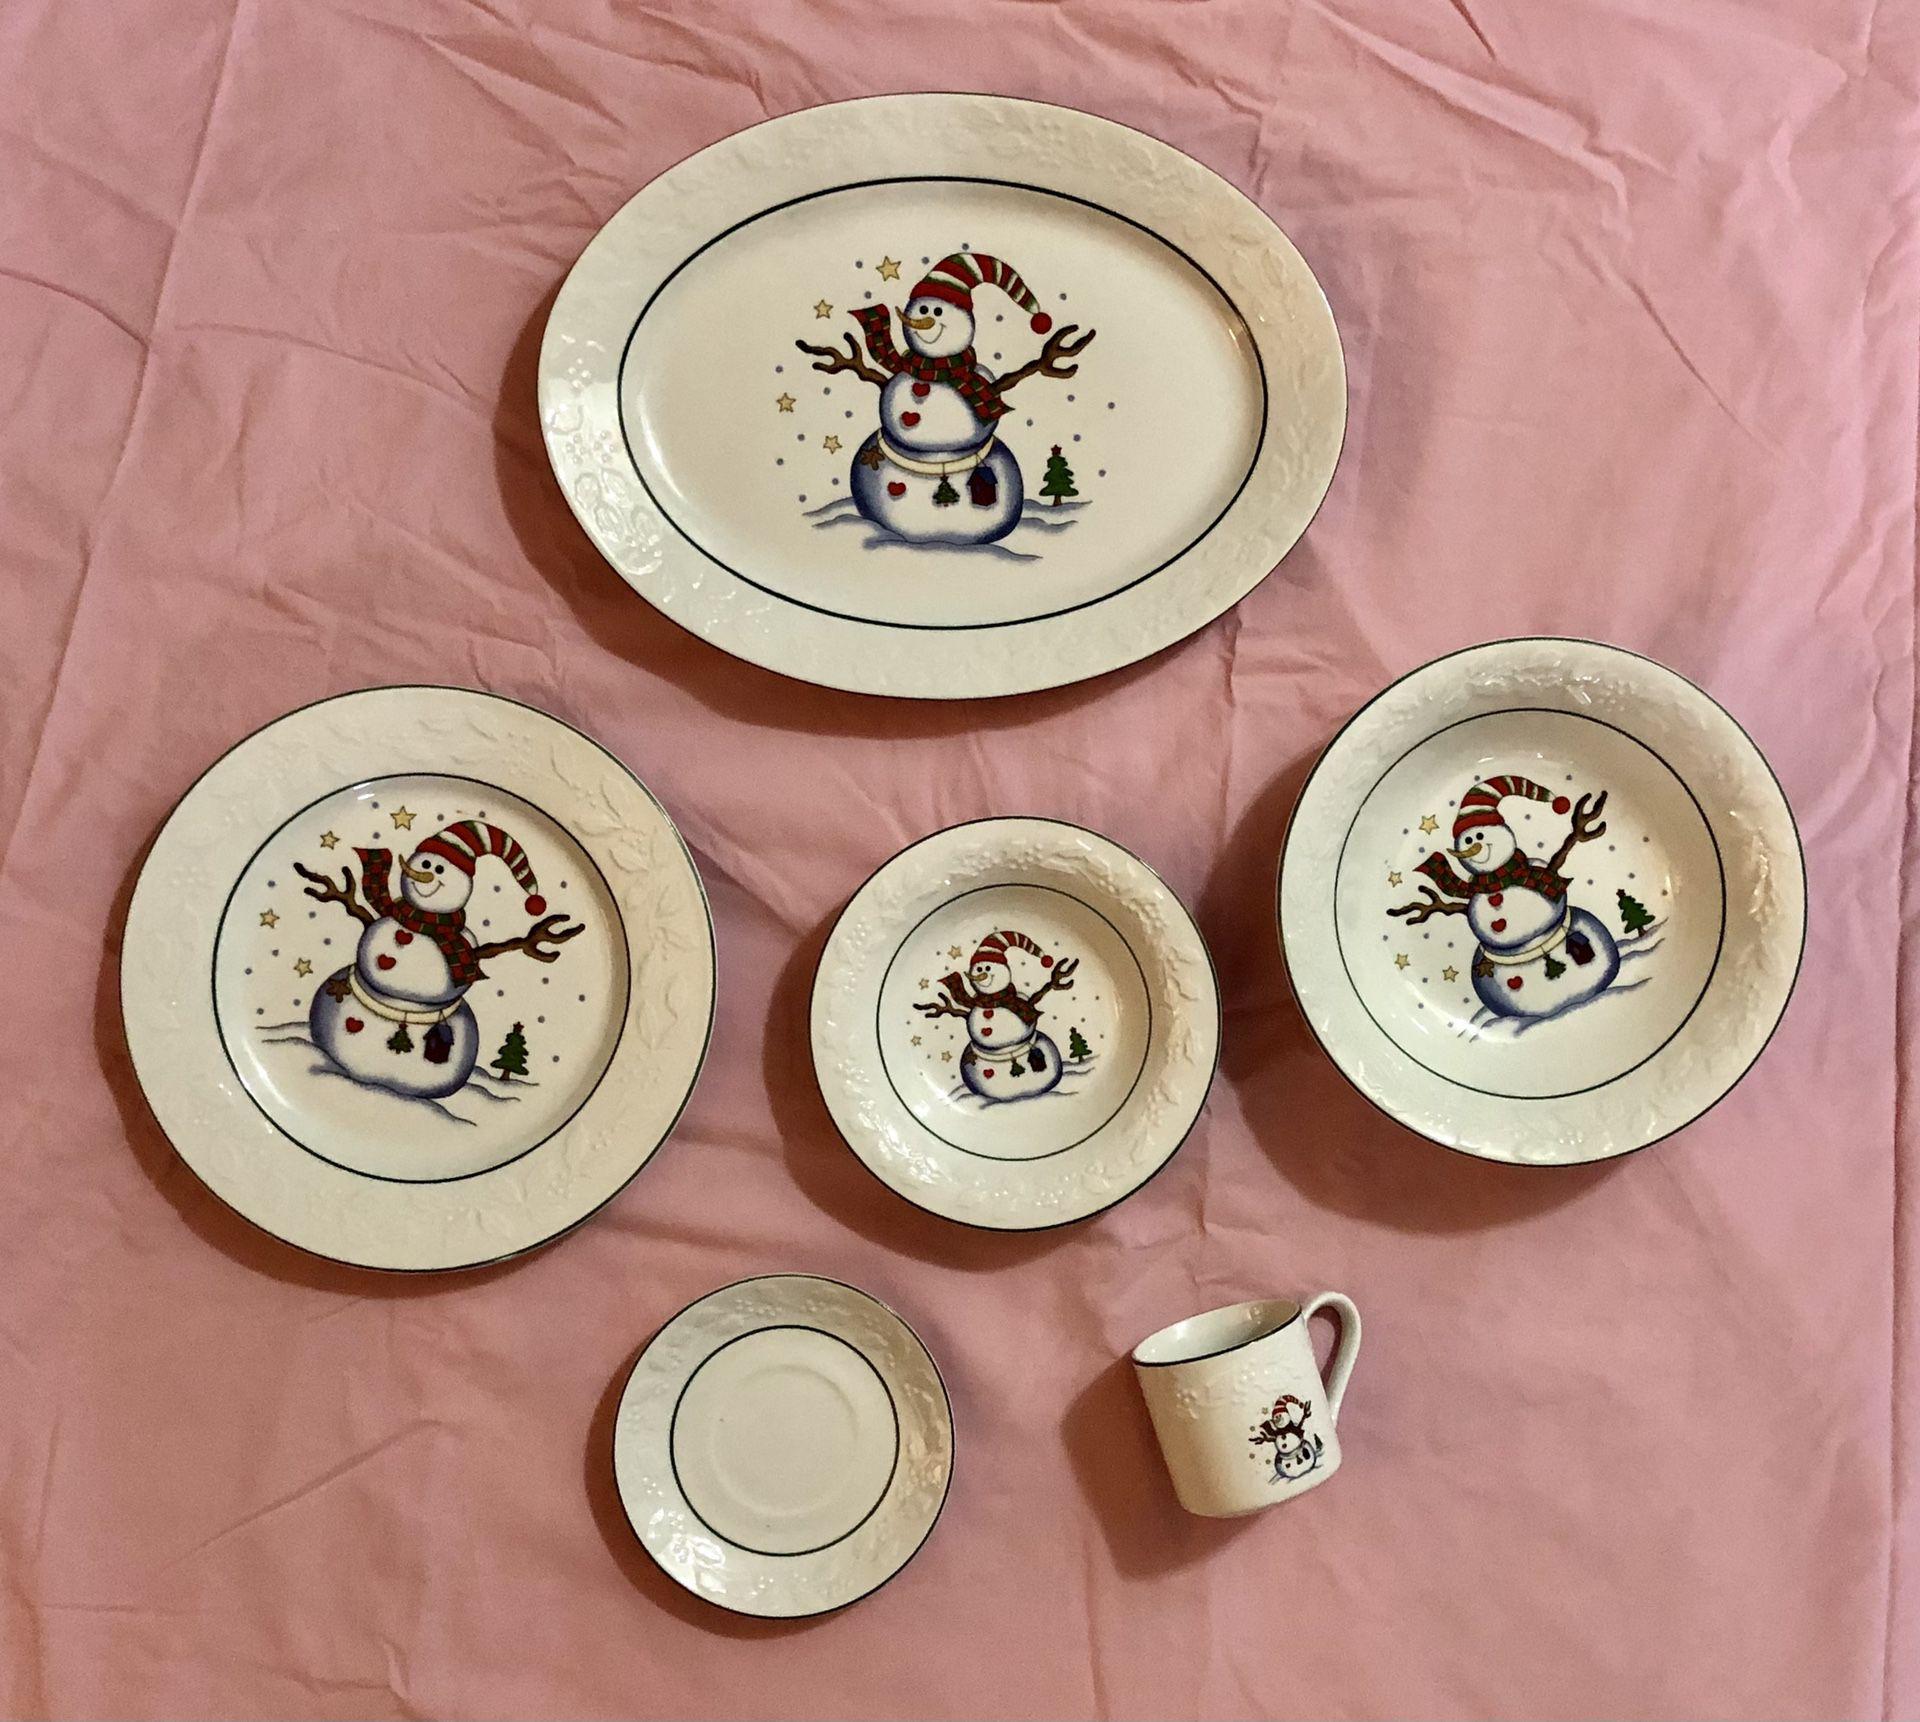 Snowman Christmas/Holiday Dinnerware 34 Pc Set (8 Tea Cup, 8 Saucers, 8 Bowls, 8 Dinner Plates, 1 Platter, 1 Large Serving Bowl)